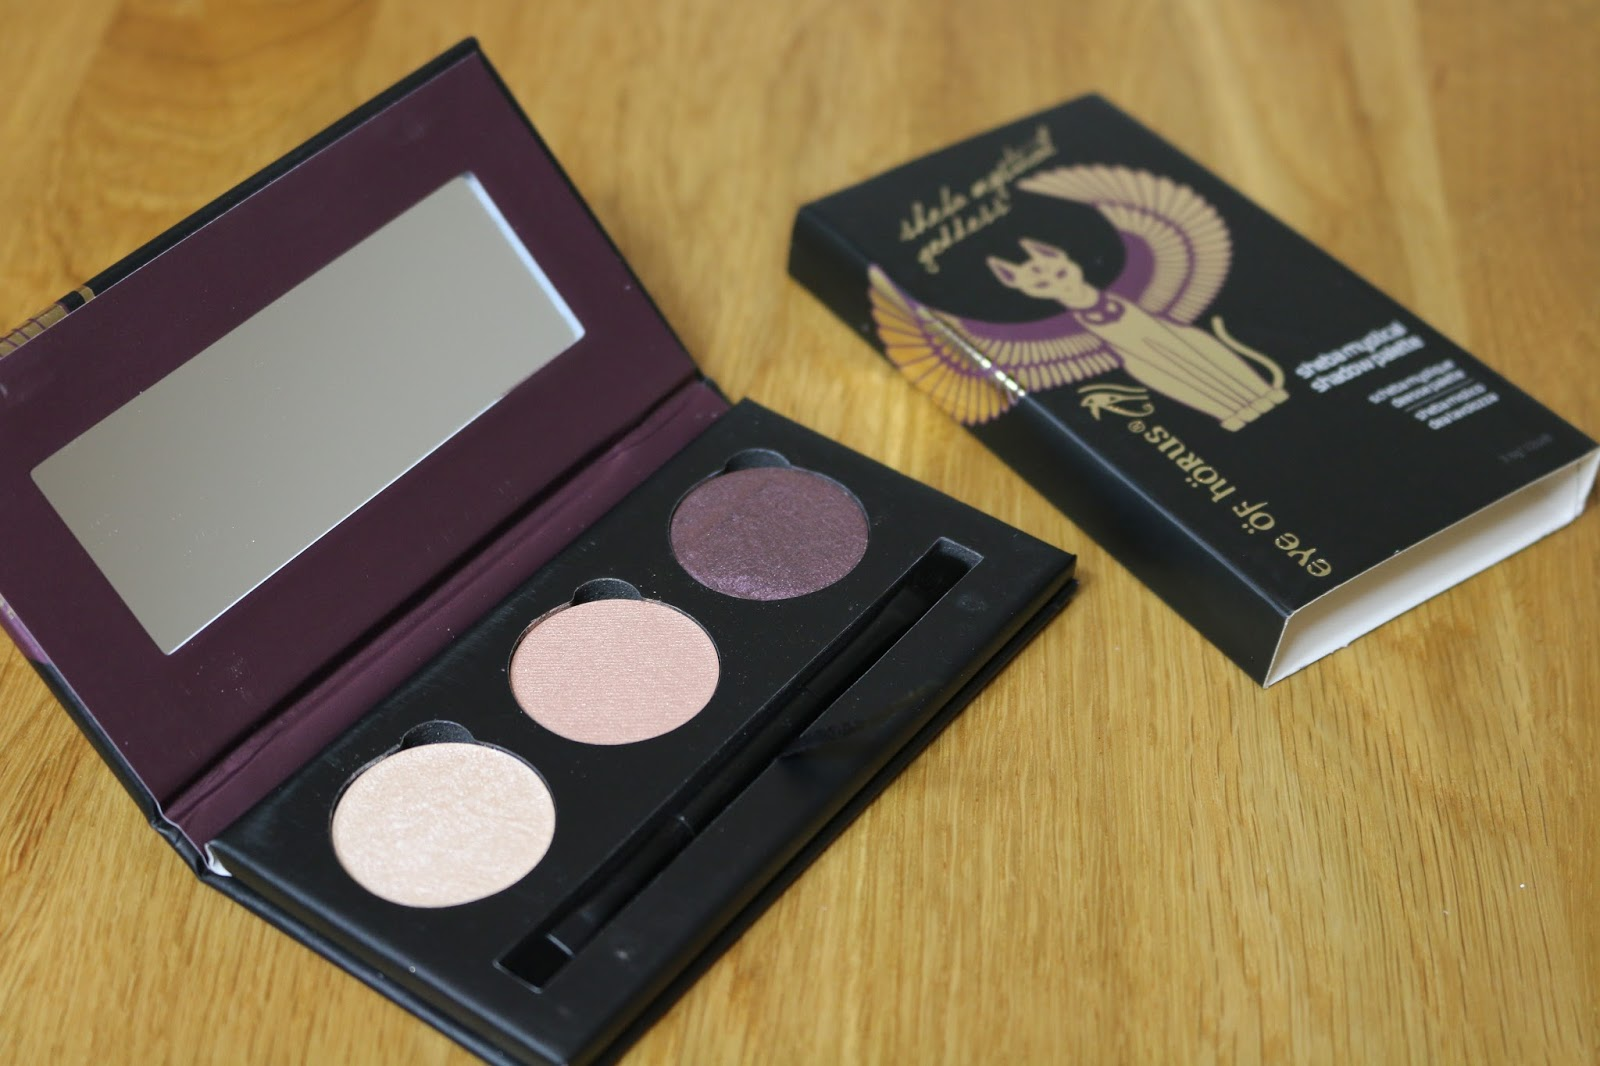 Eye of Horus' new Baked Goddess Shadow Palettes